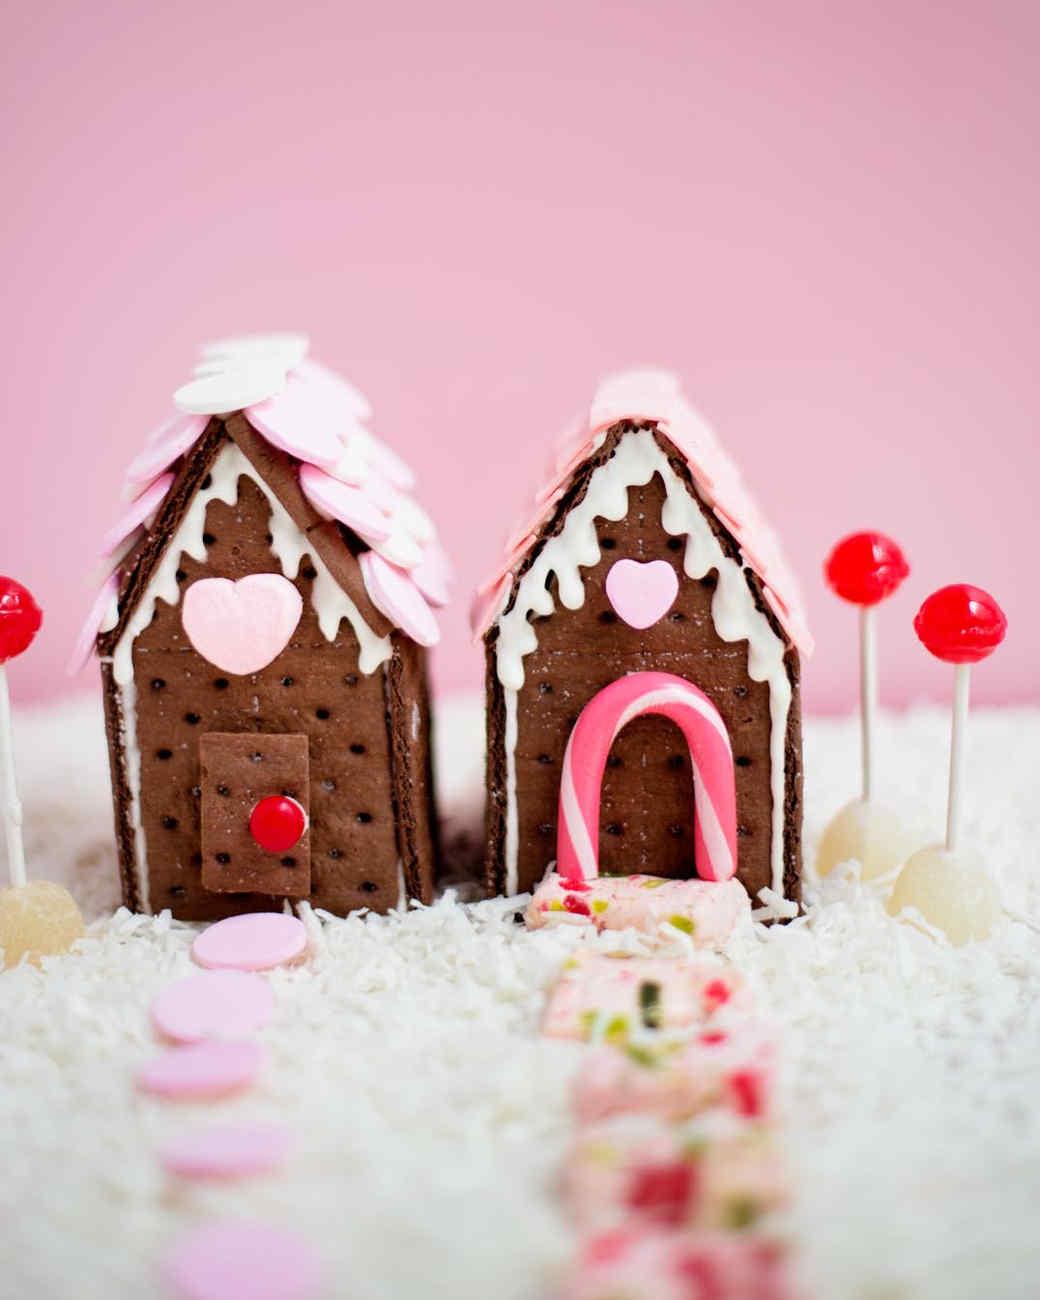 candy-aisle-cookie-house-1-0215.jpg